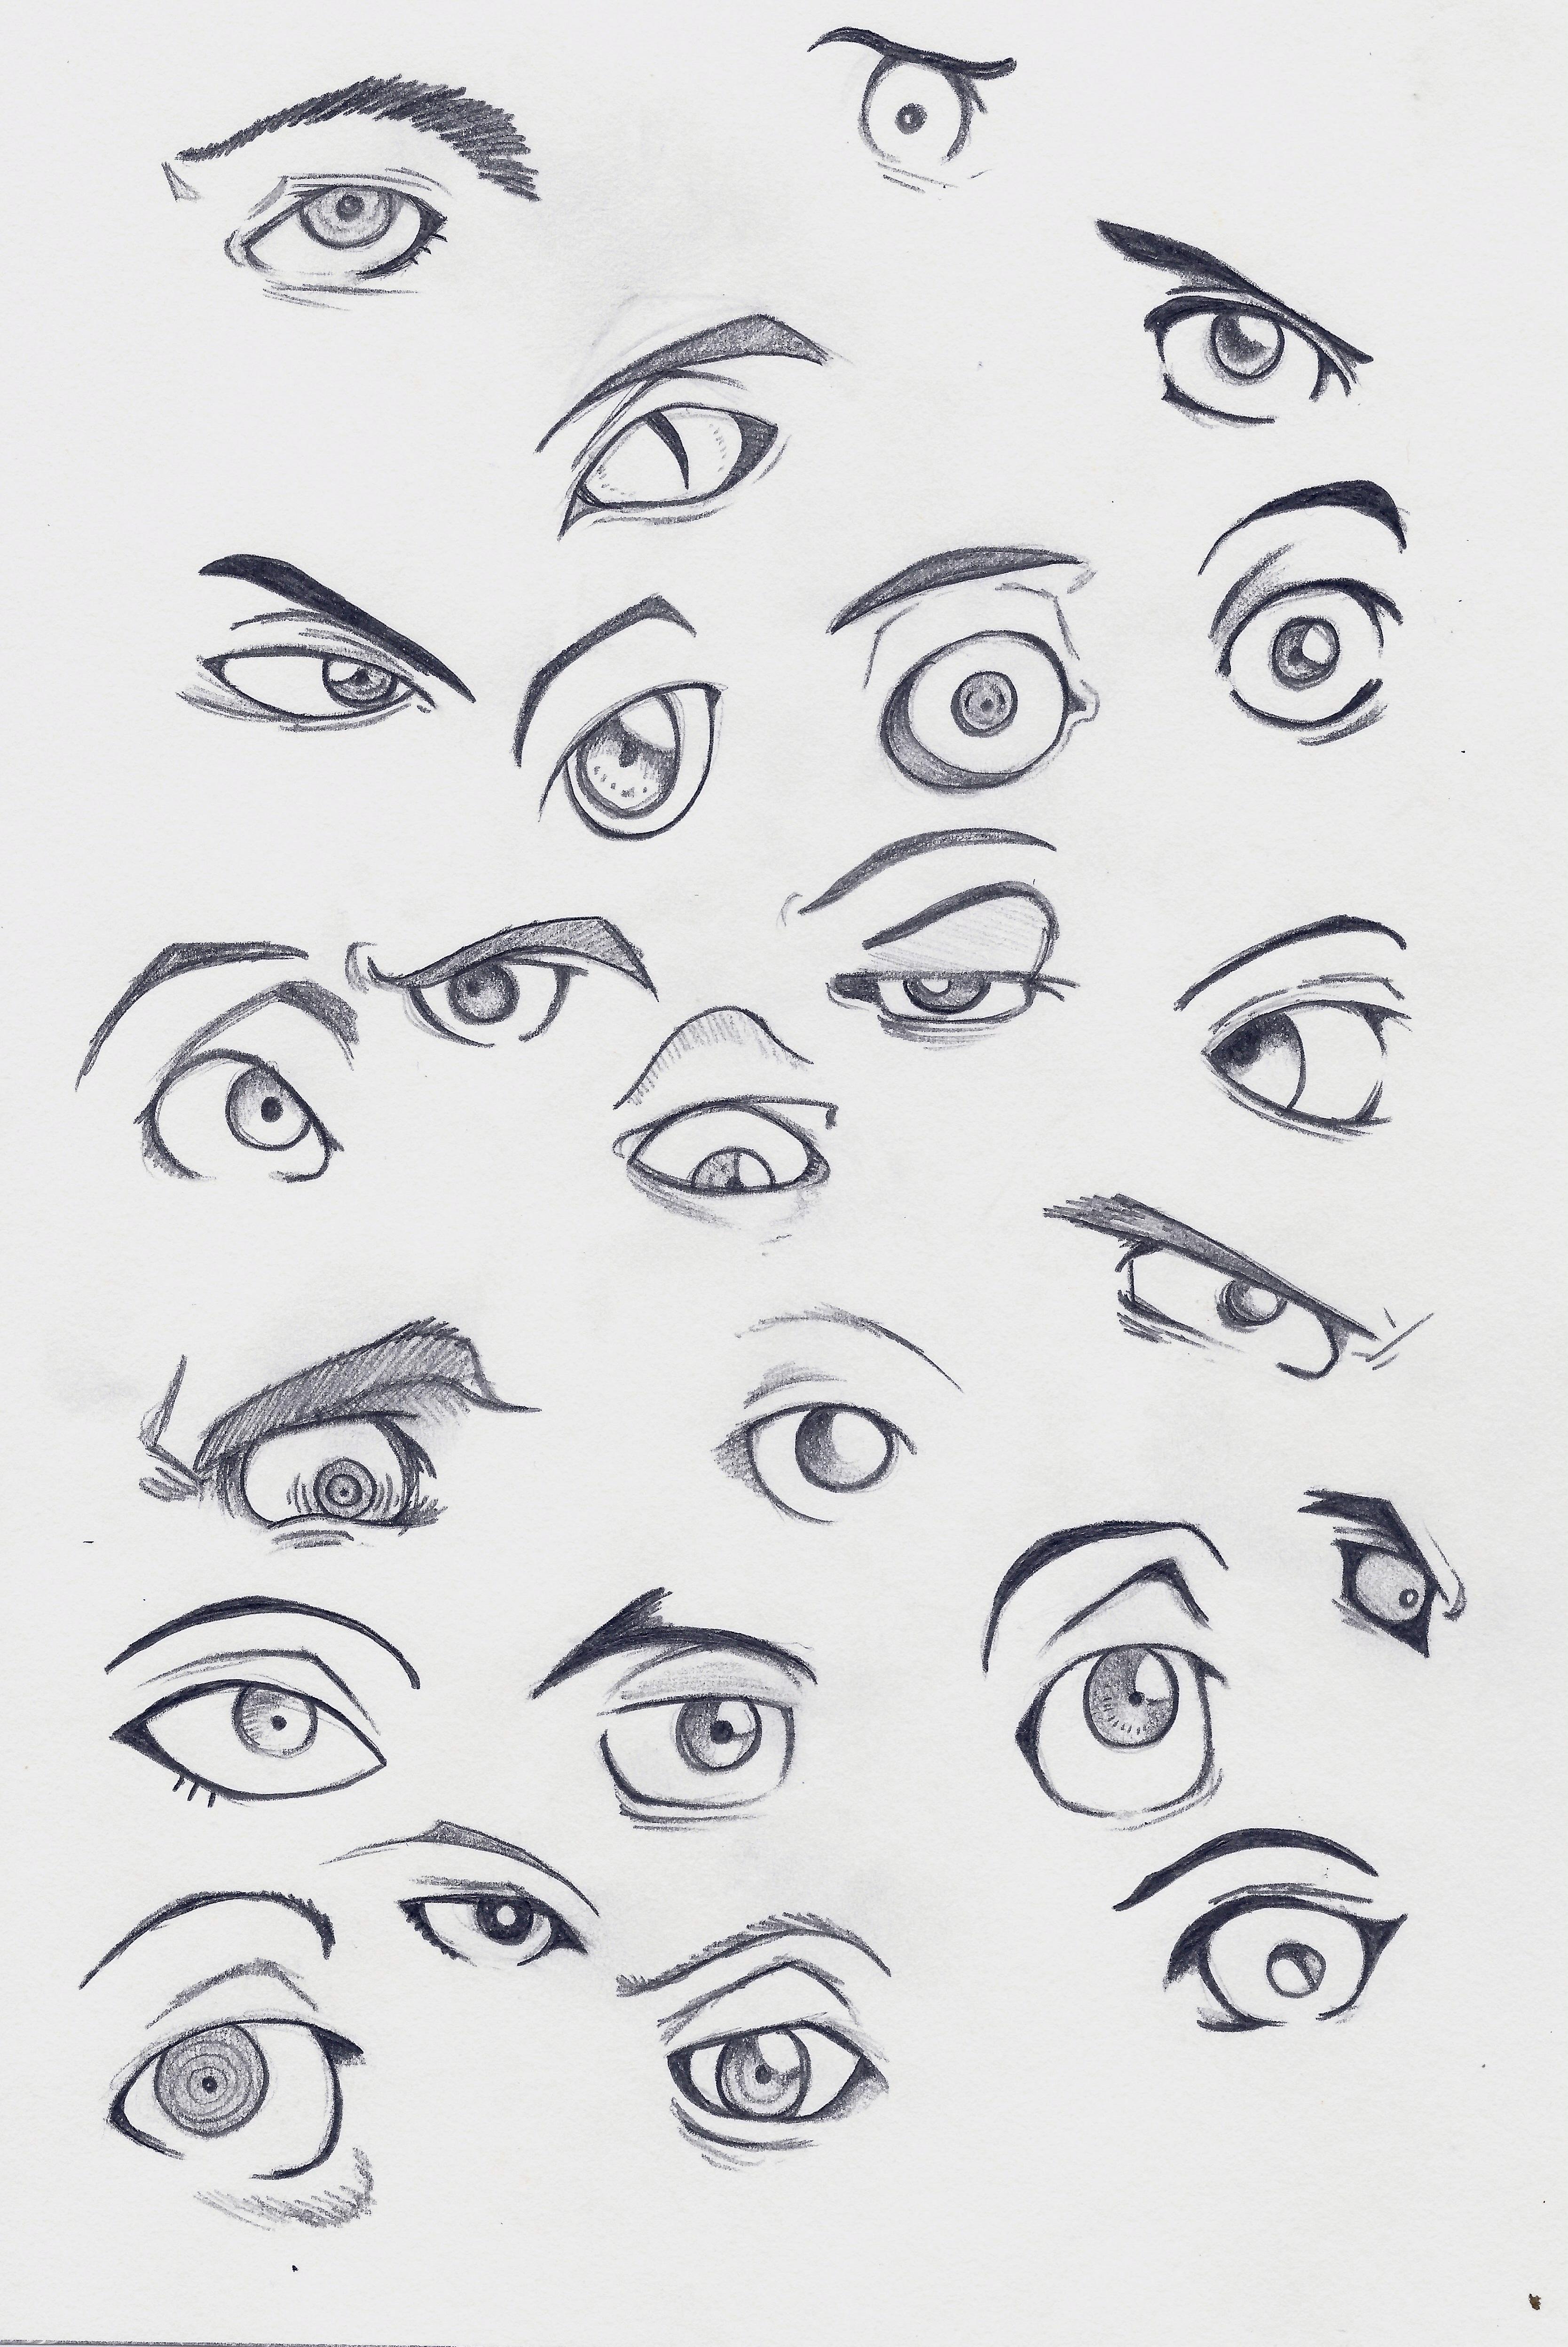 manga eye coloring pages - photo#42